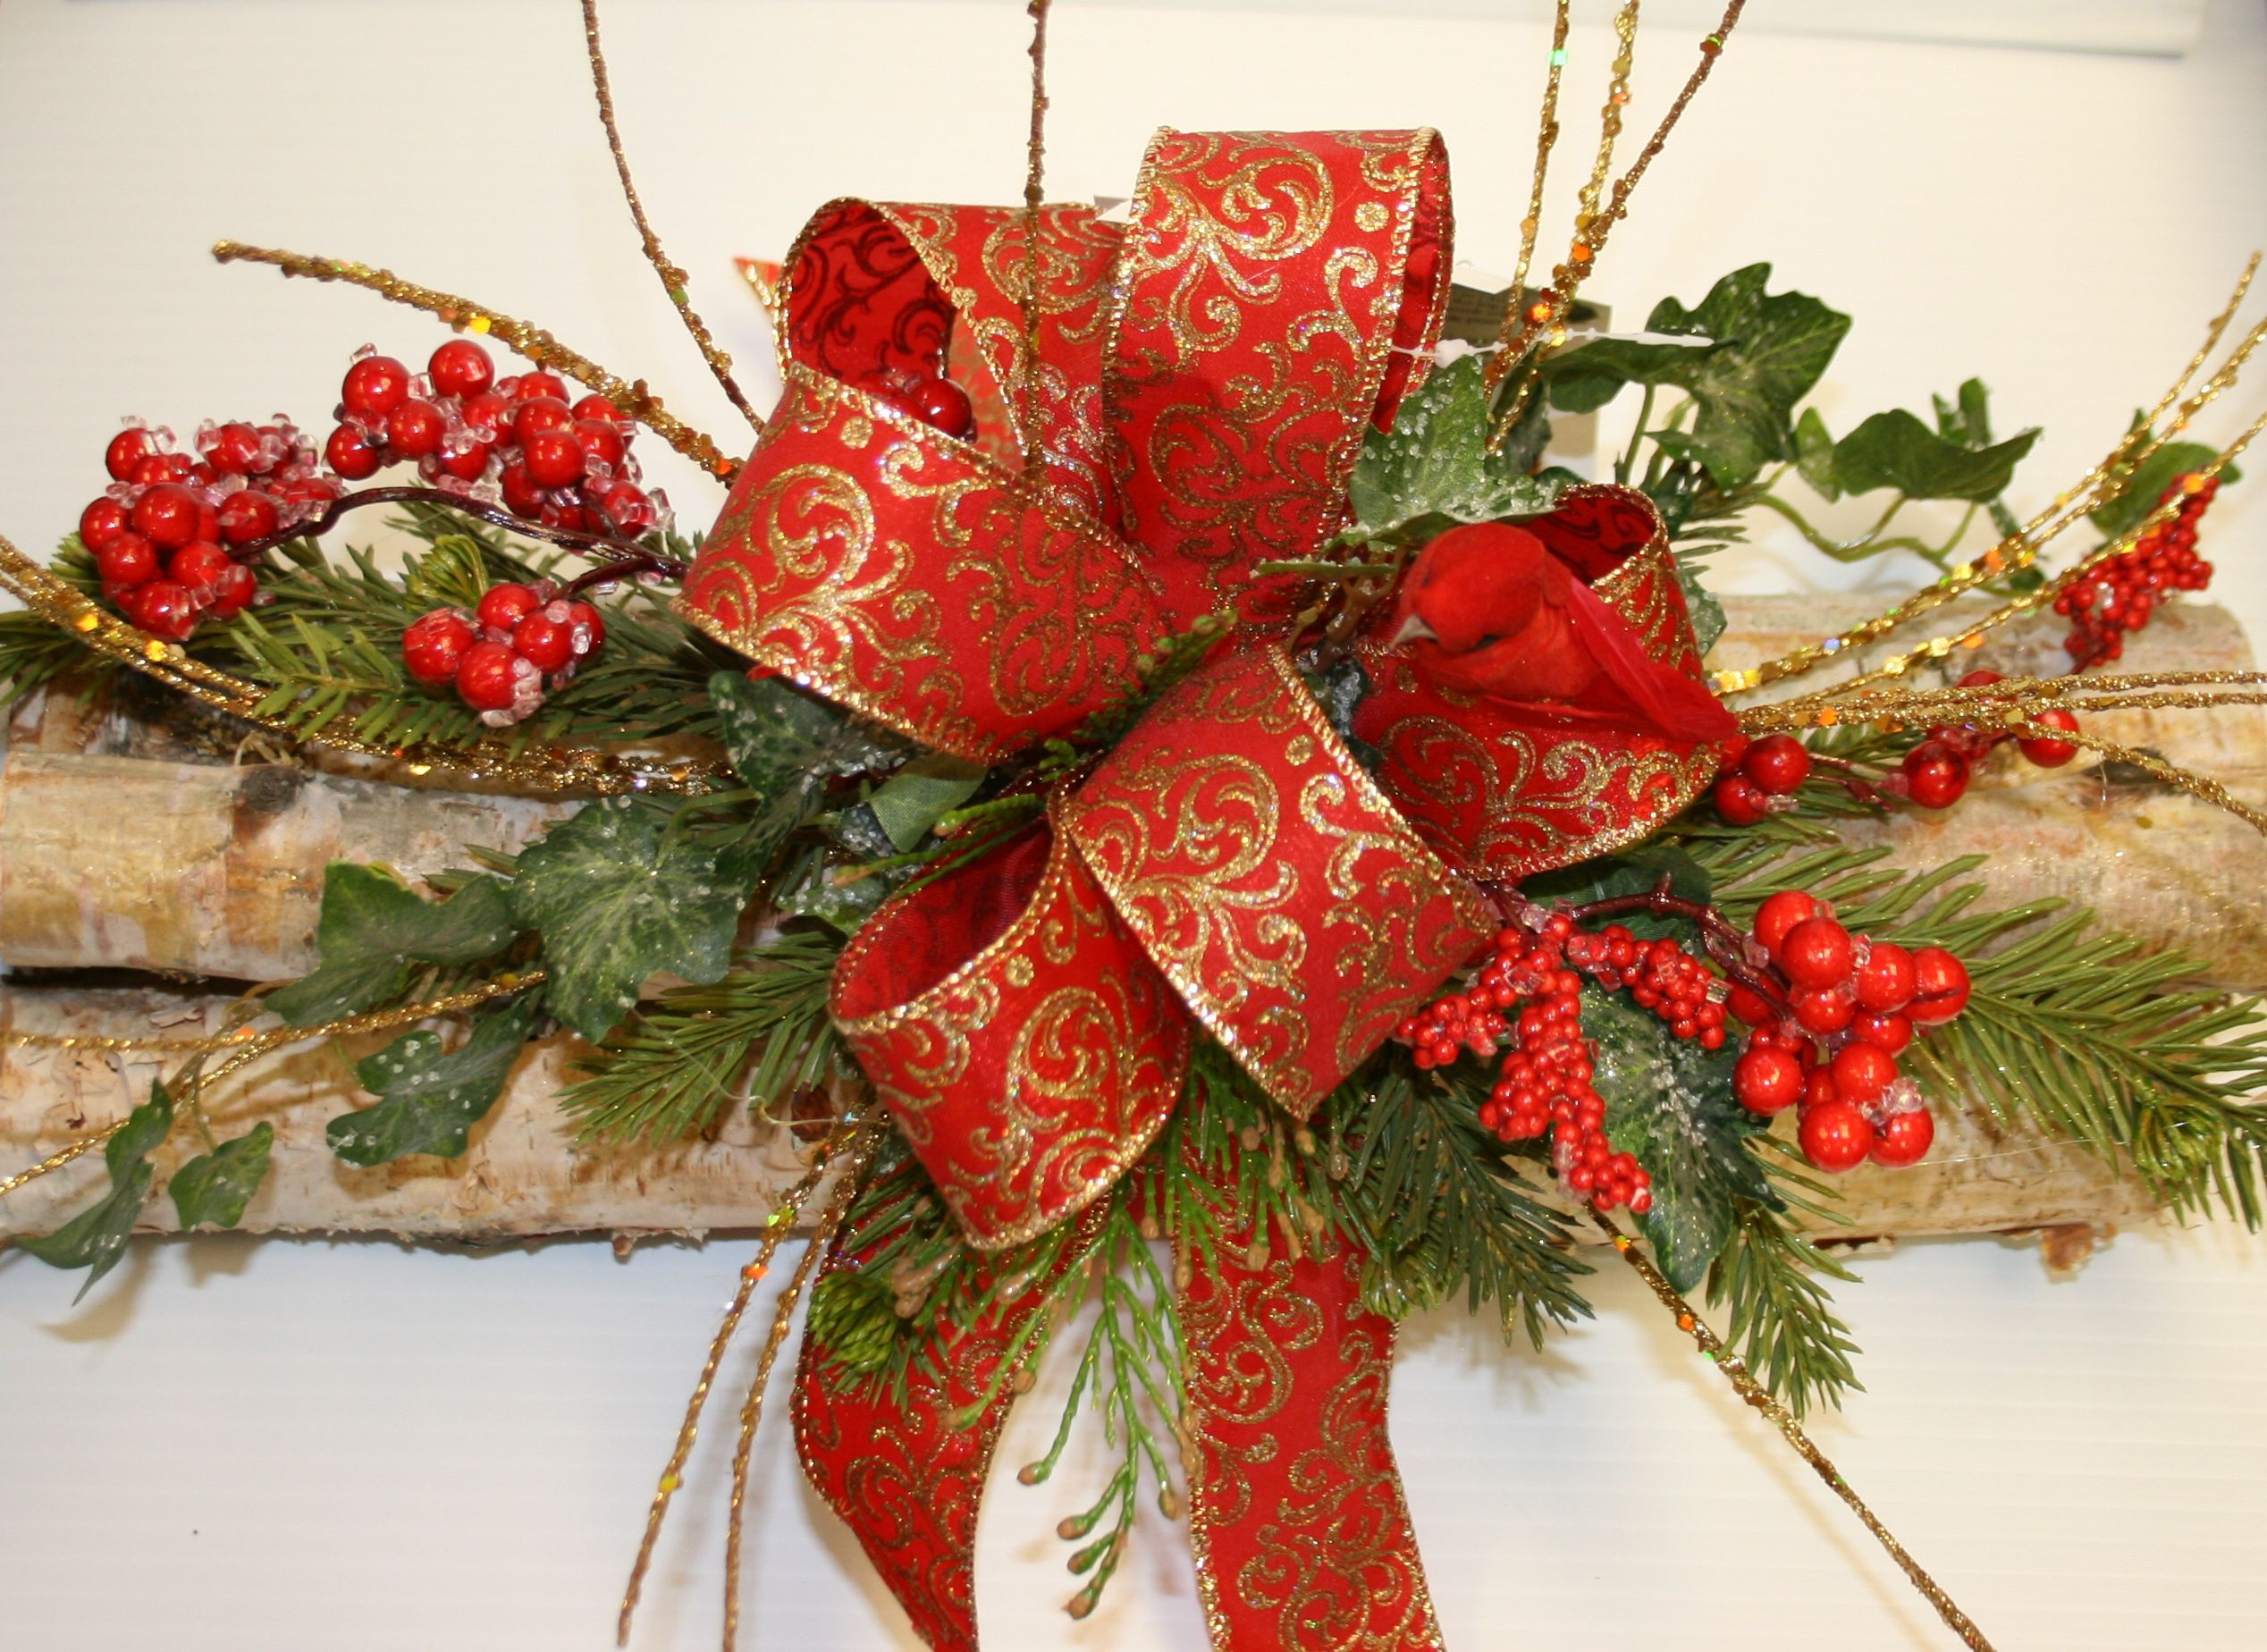 How To Make A Good Christmas Decoration - Log christmas centerpieces designer made decorative yule logs make a great centerpiece